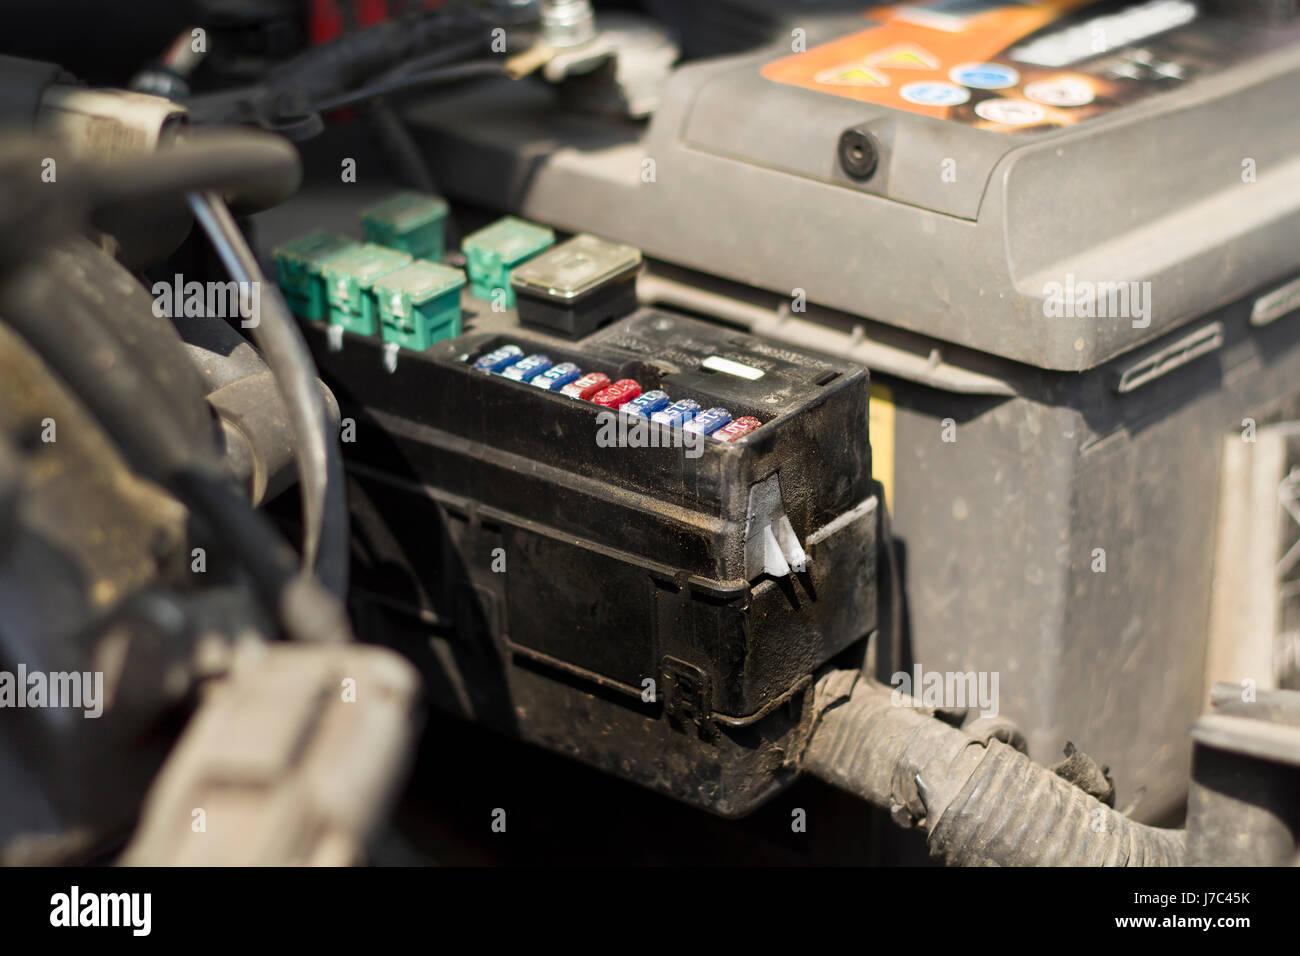 Car Fuse Stock Photos Images Alamy Automobile Box Under The Bonnet Of Image